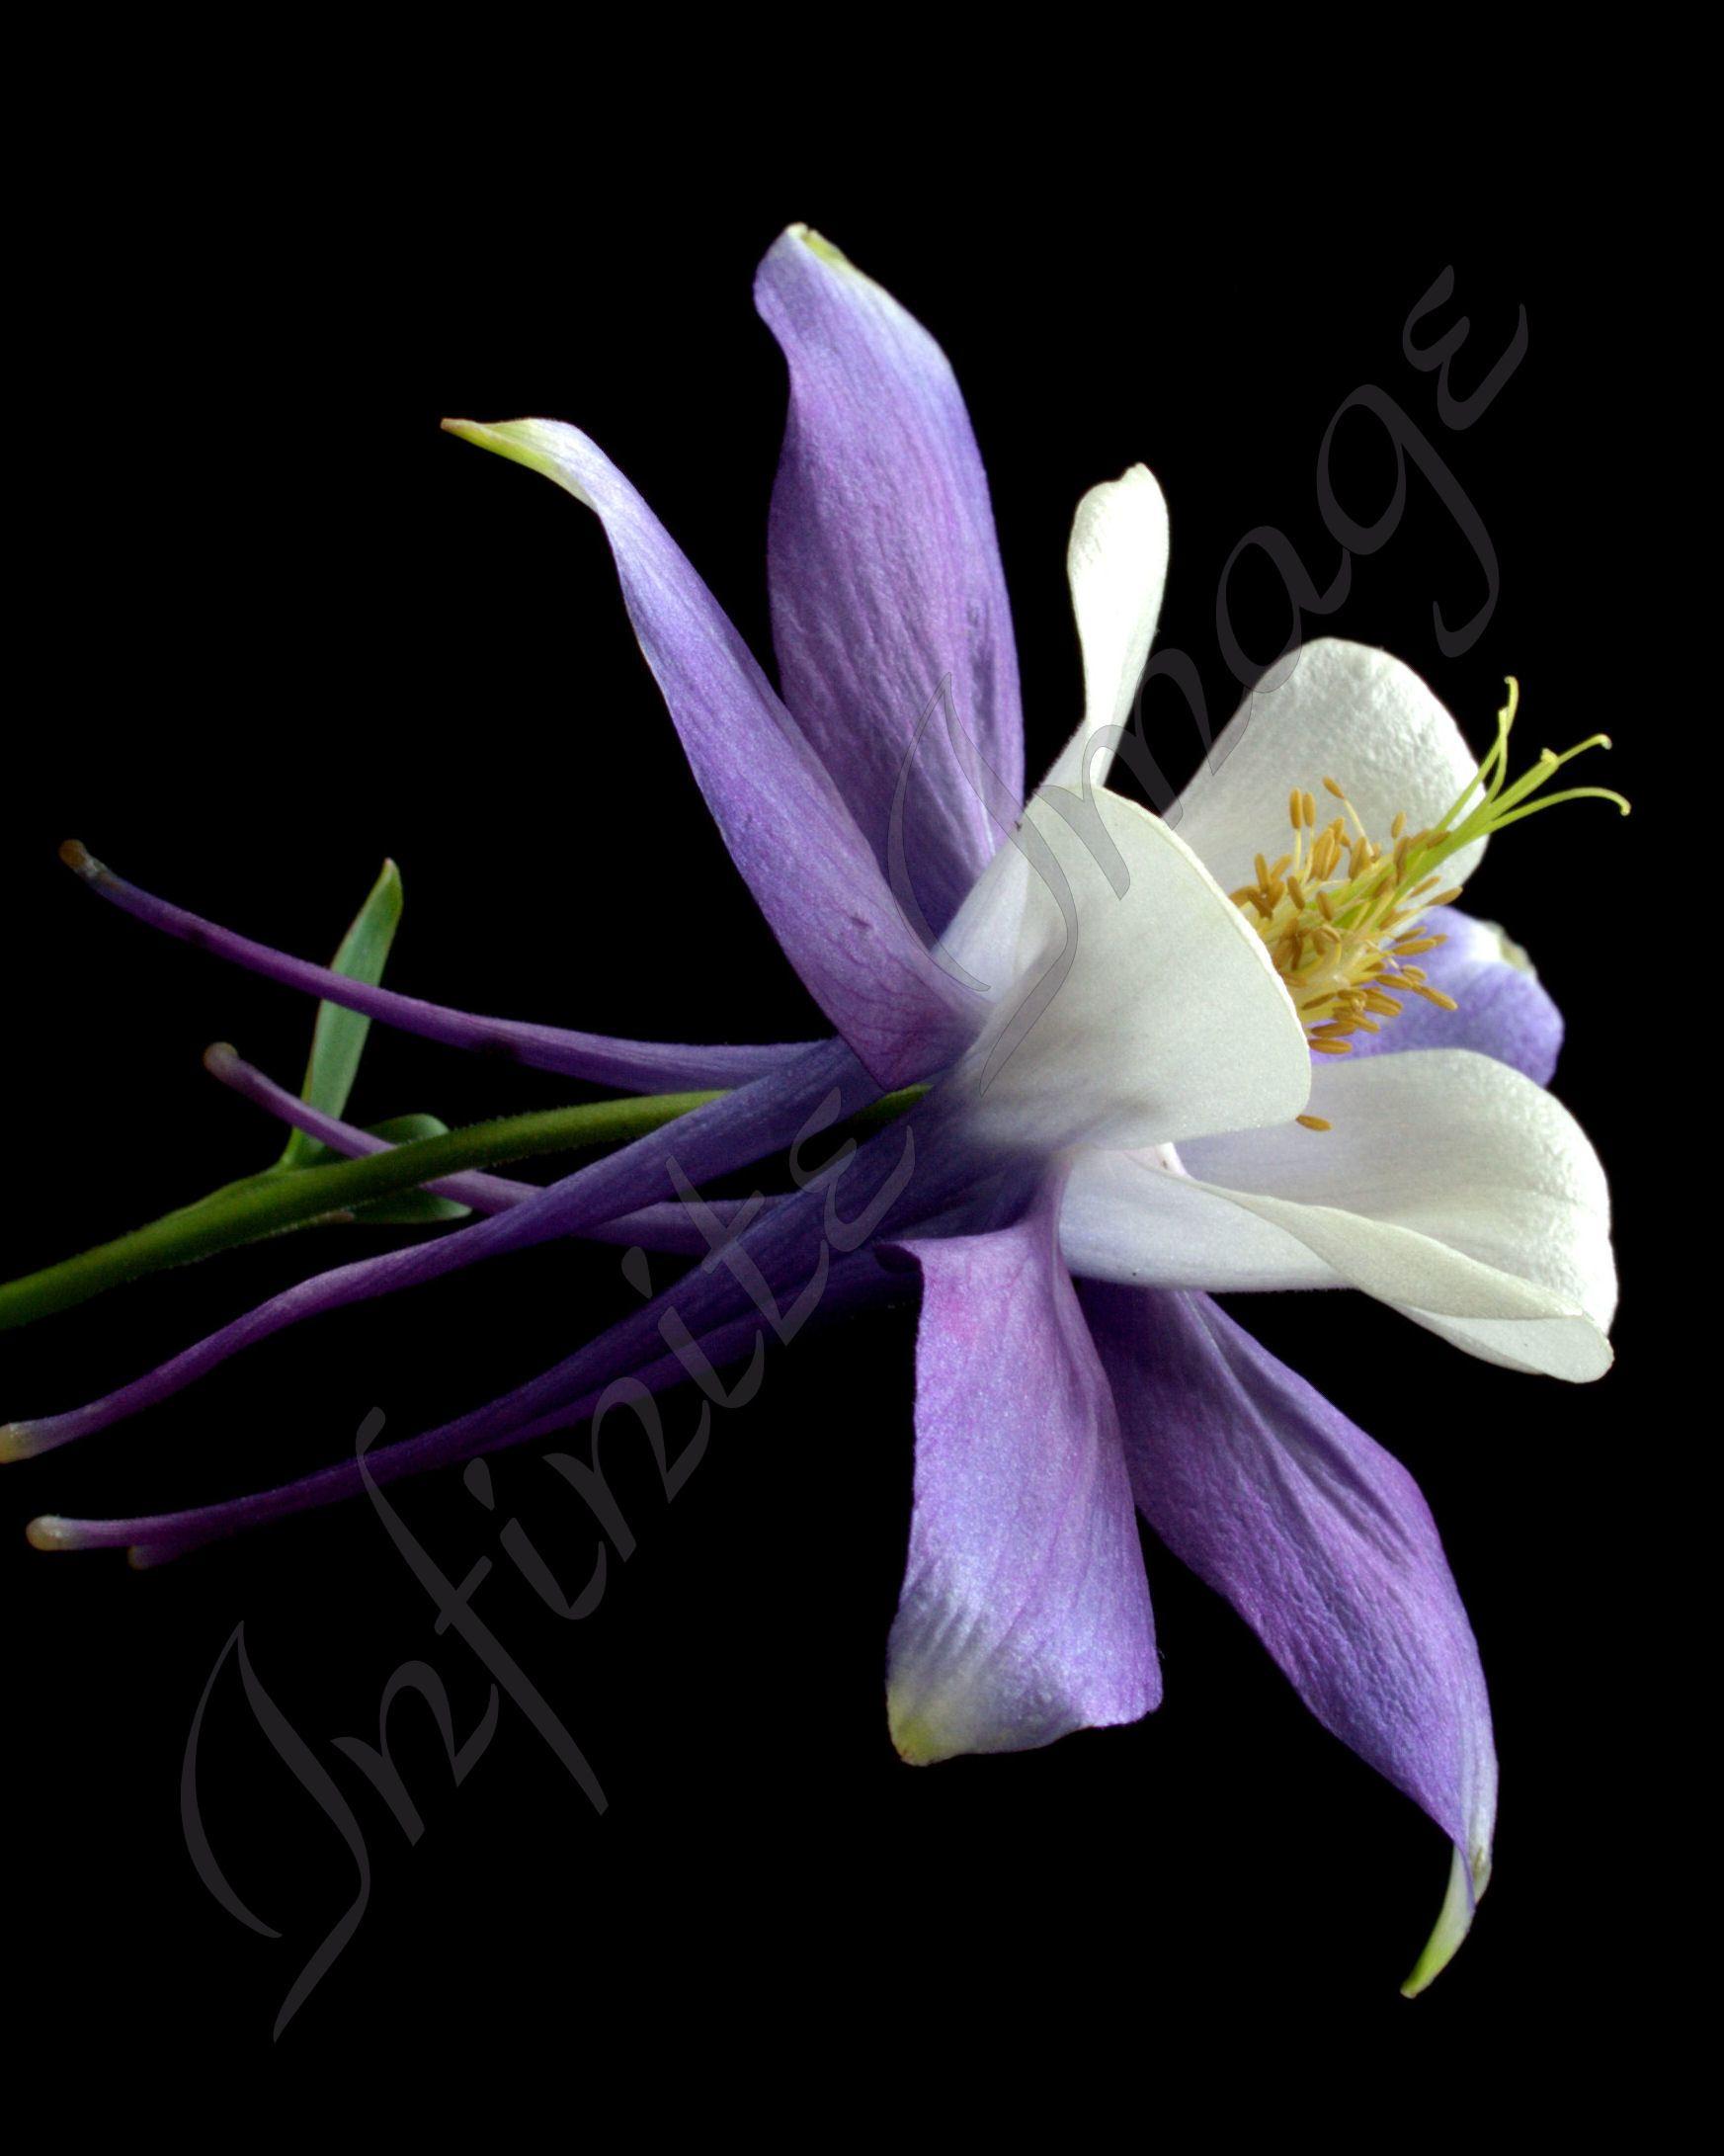 Fine art prints for sale 16x20 fine art purple beauty artsyhome fine art prints for sale 16x20 fine art purple beauty artsyhome izmirmasajfo Gallery